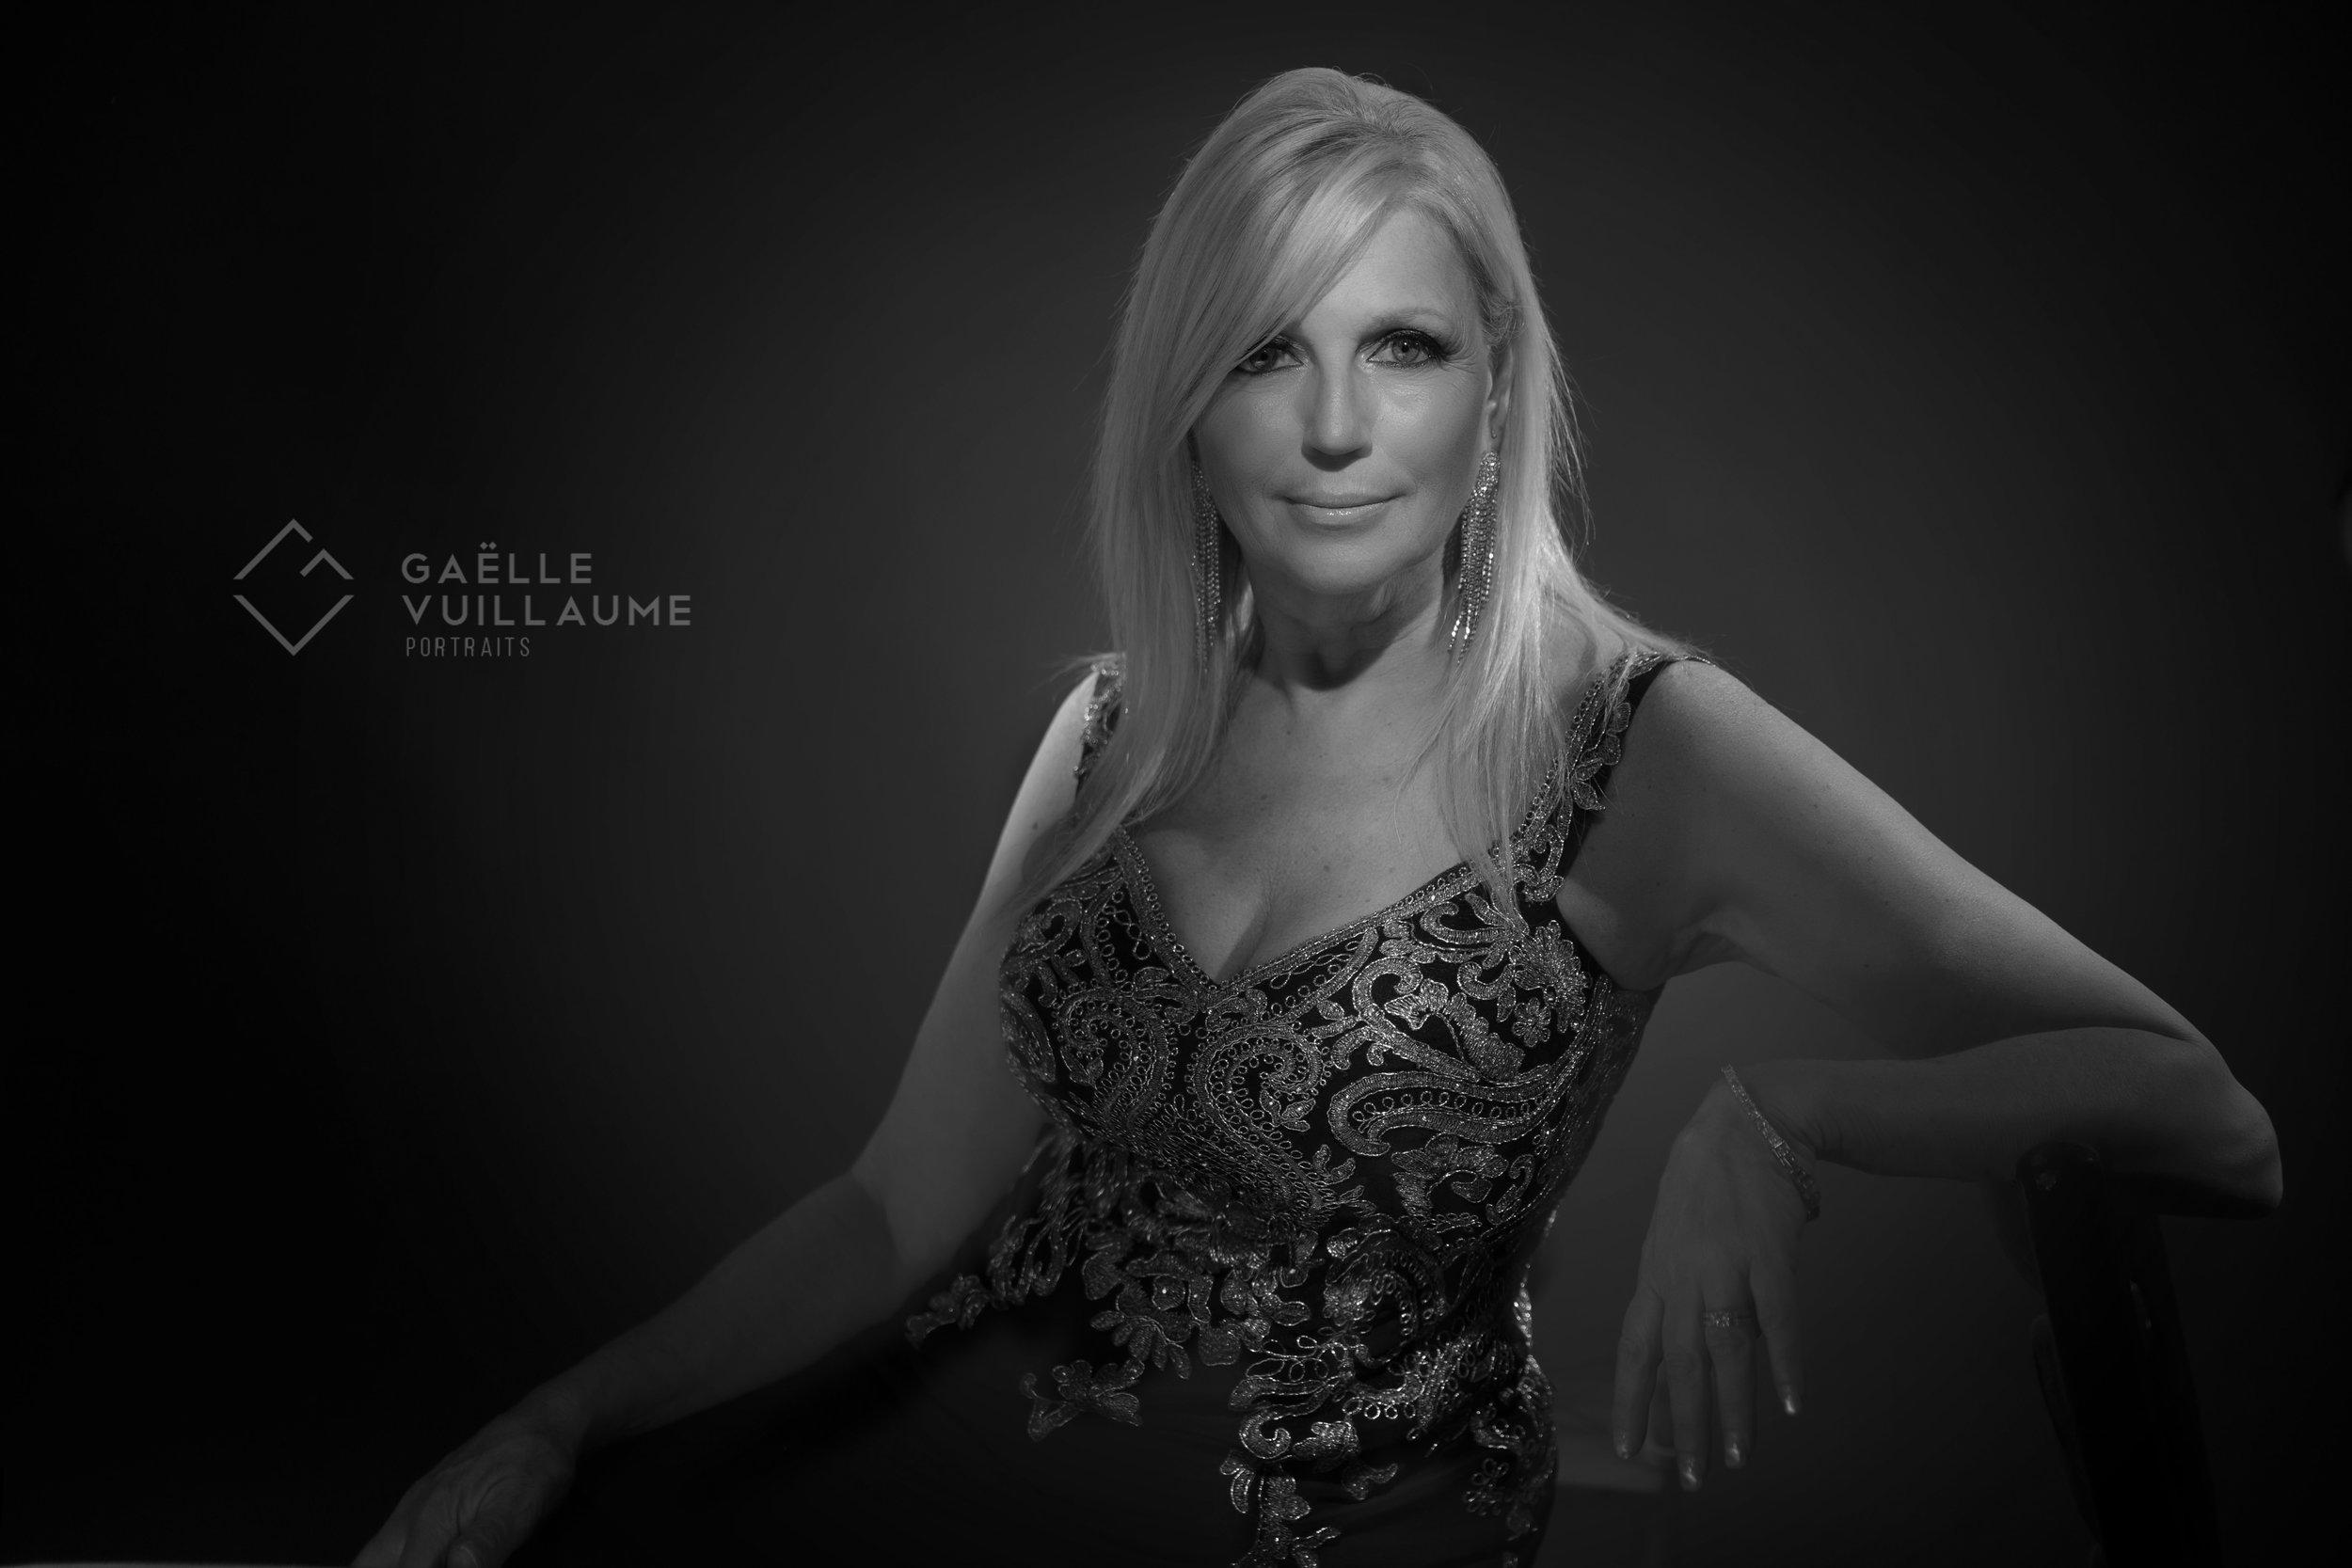 sylvie bardier NB by Gaelle Vuillaume.jpg